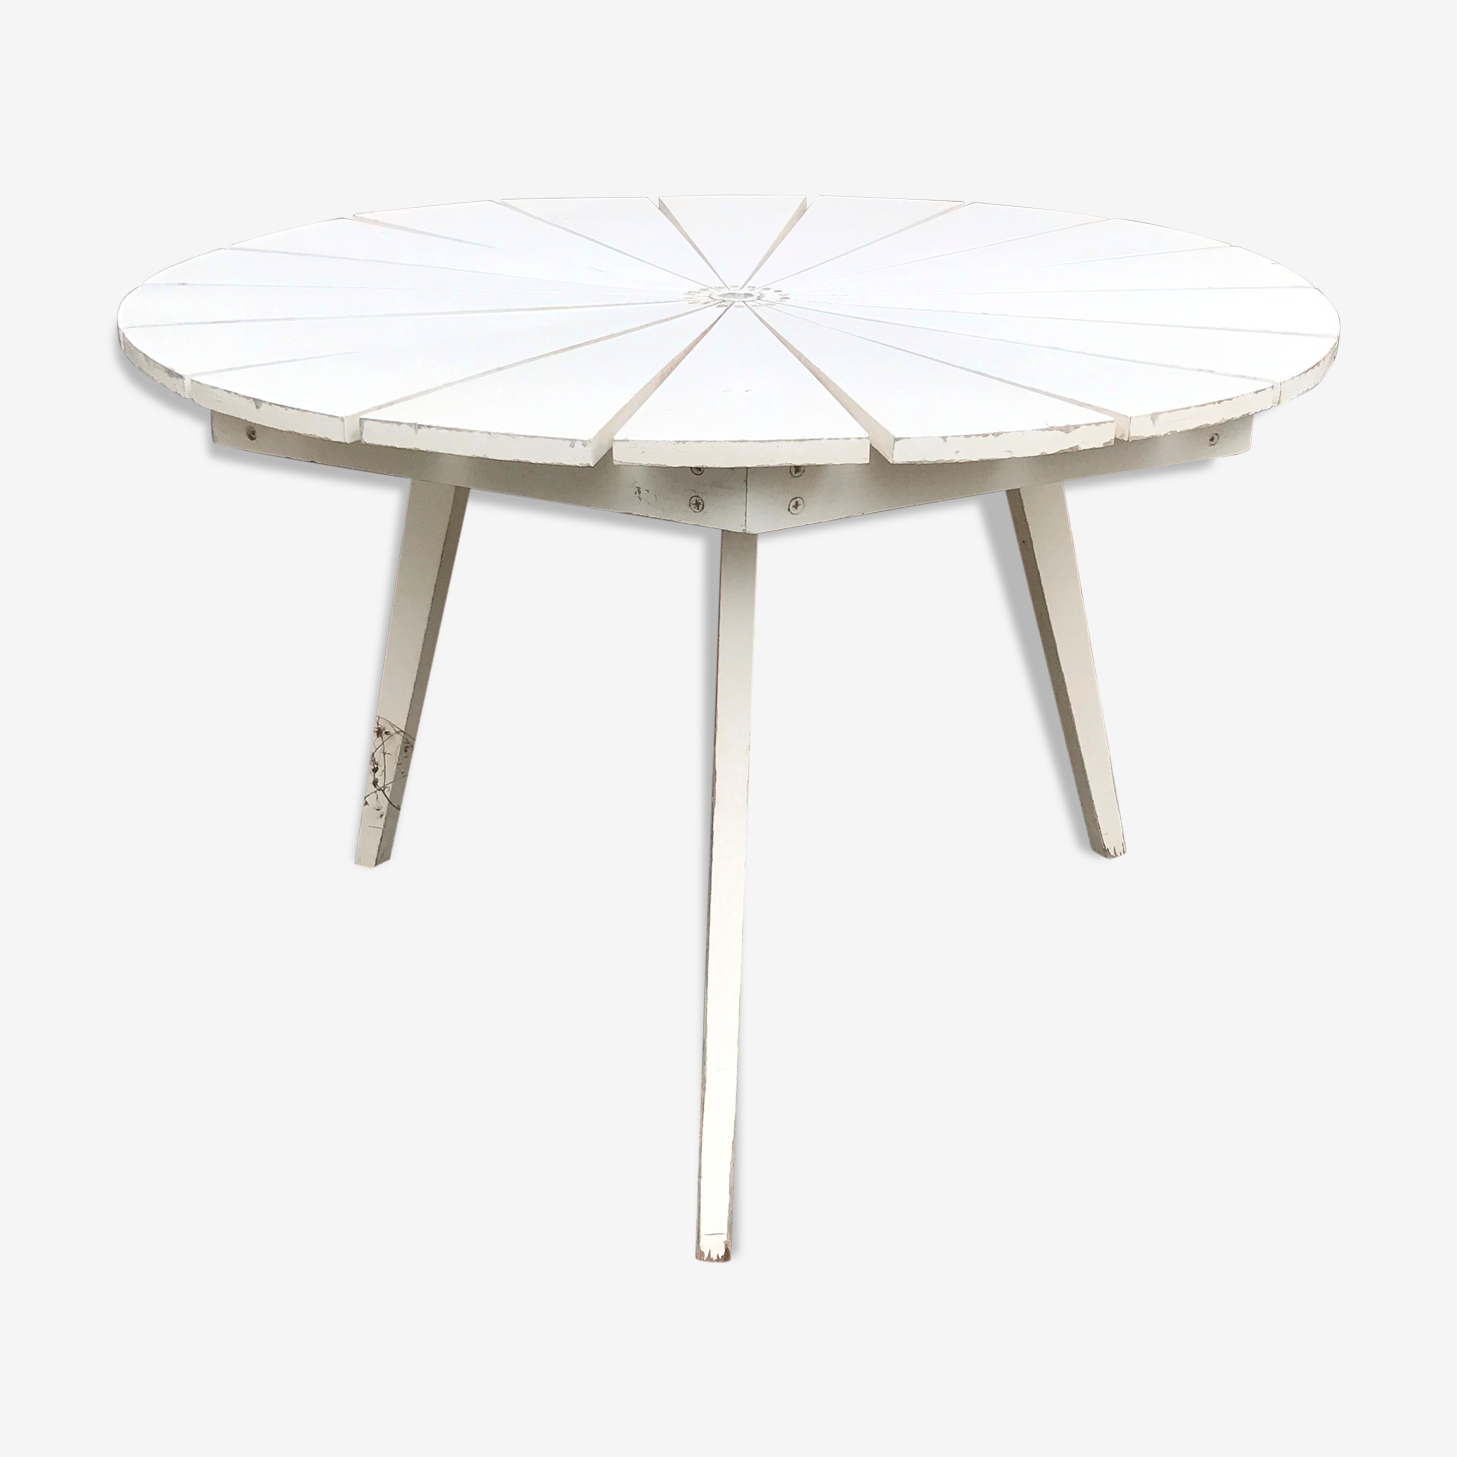 Folding round table 3 feet